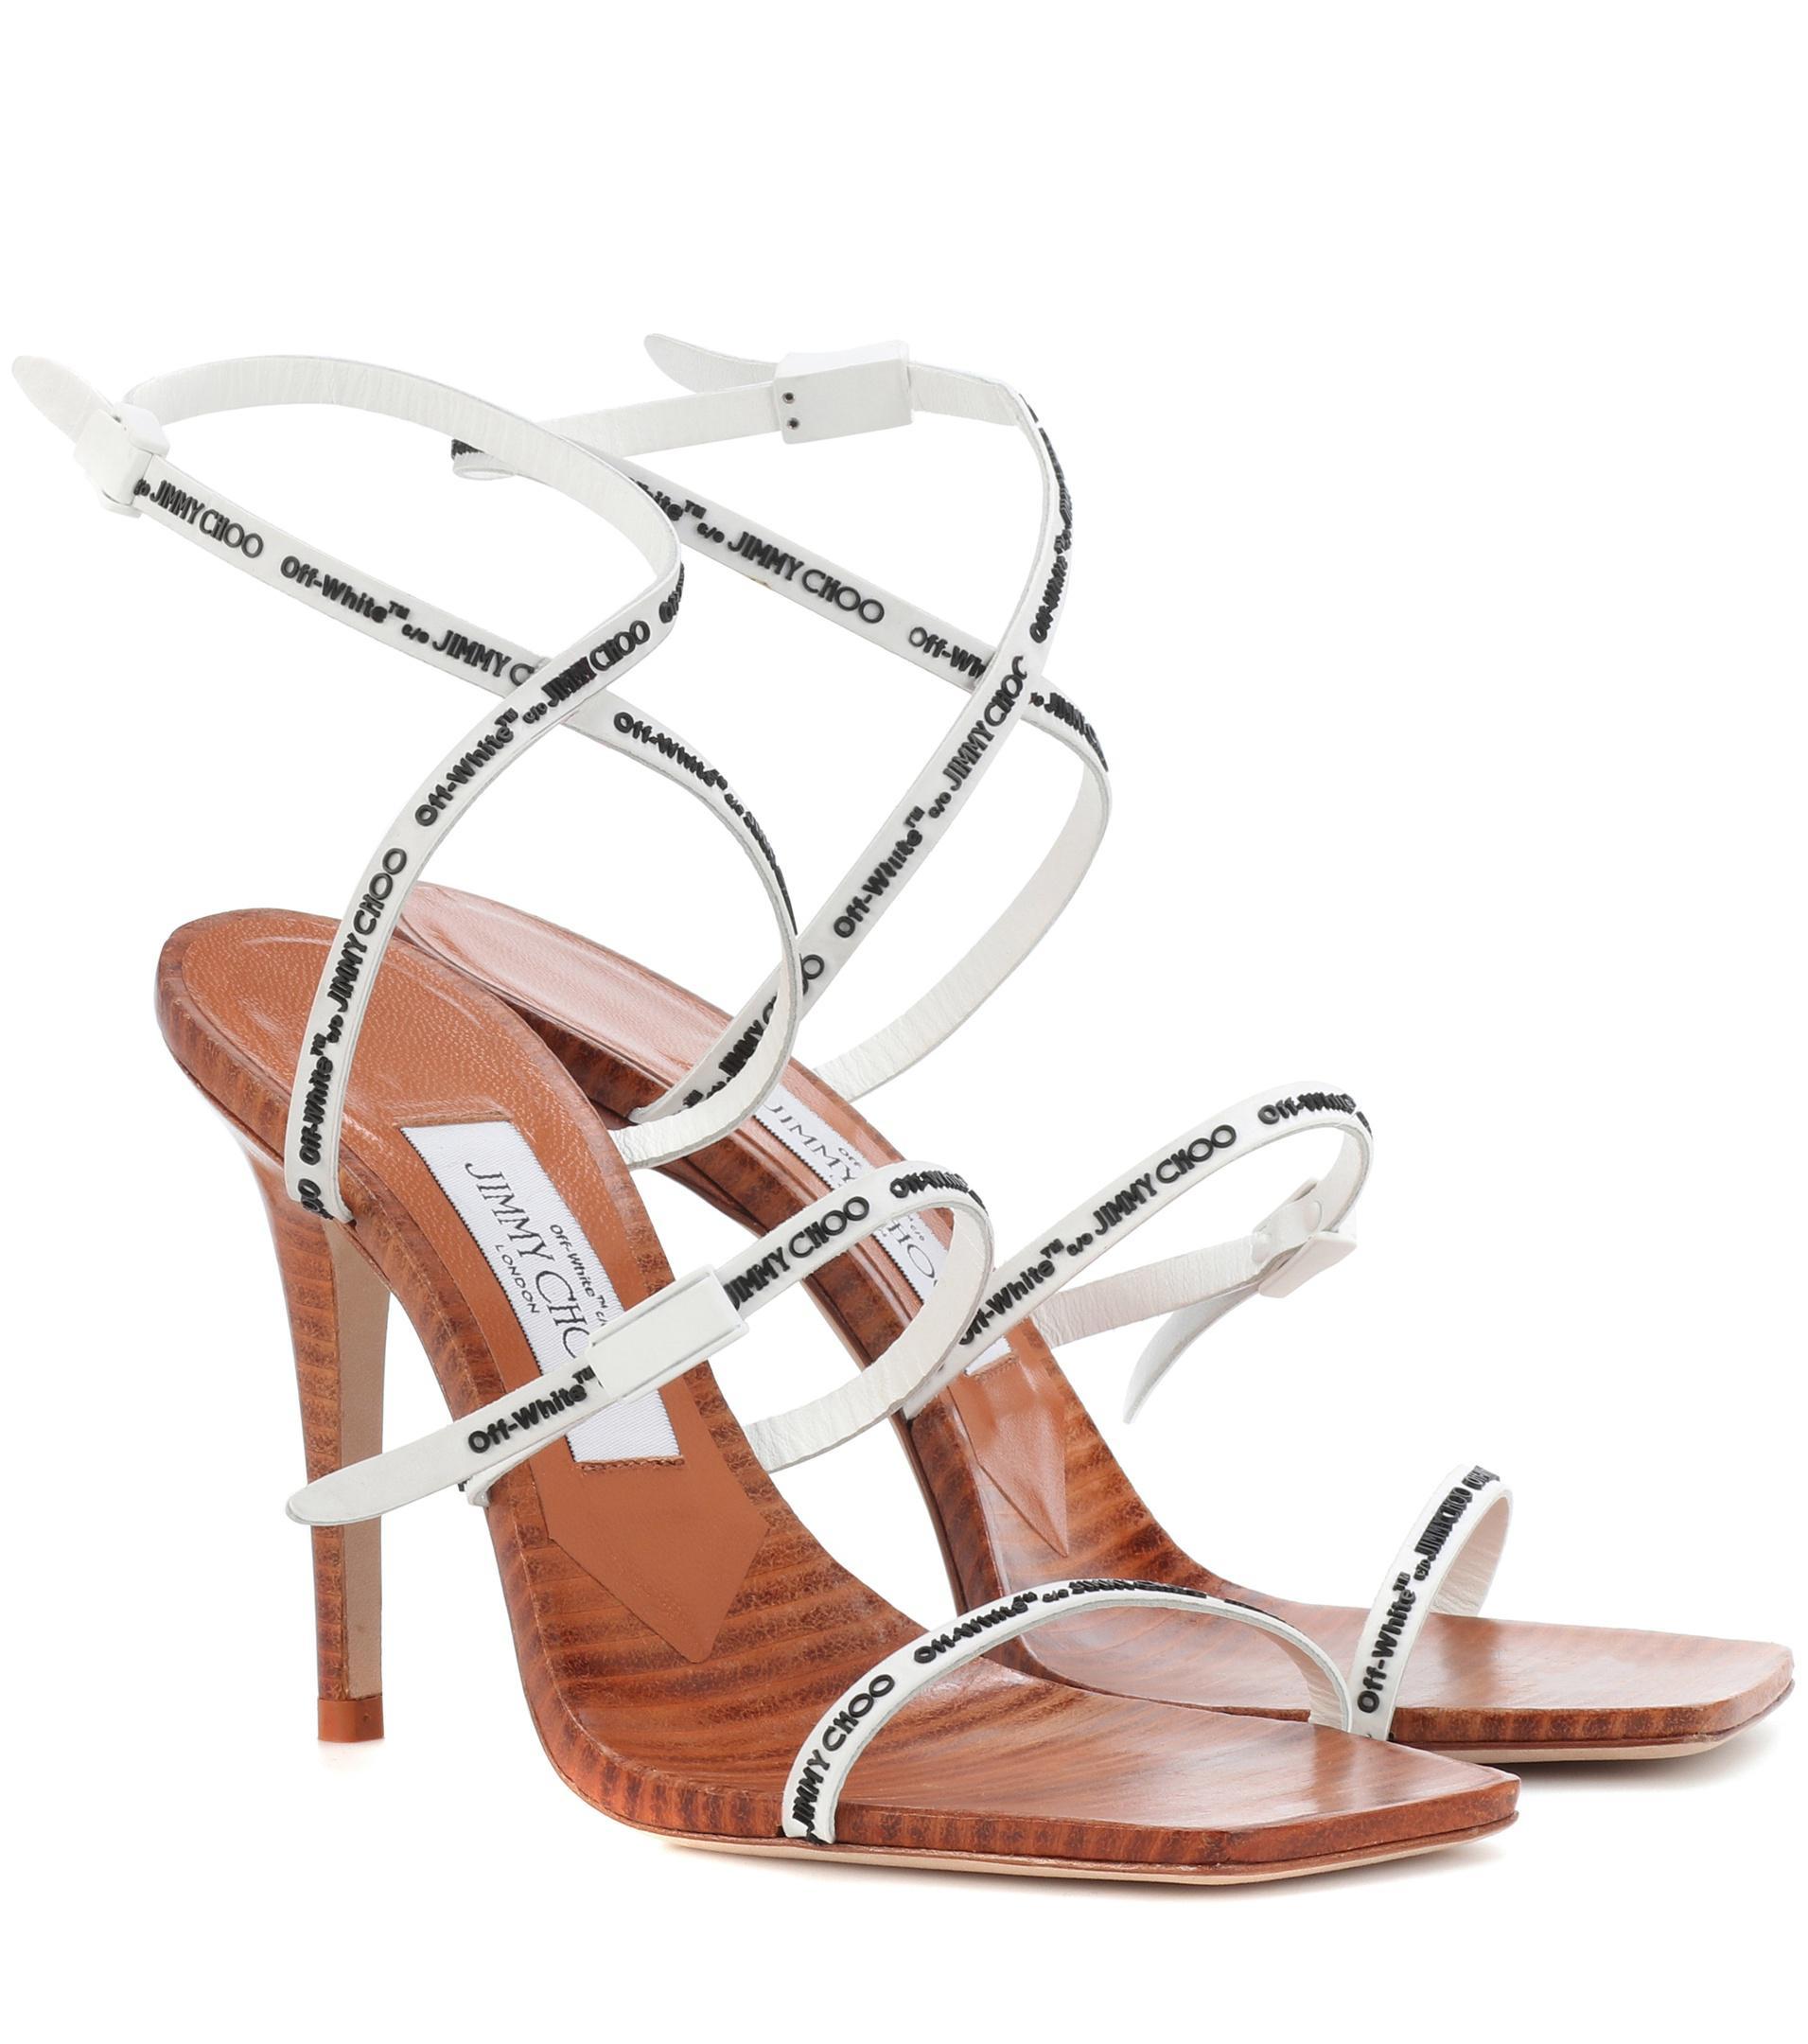 67c833207b686 Jimmy Choo Brown X Off-white Jane 100 Sandals